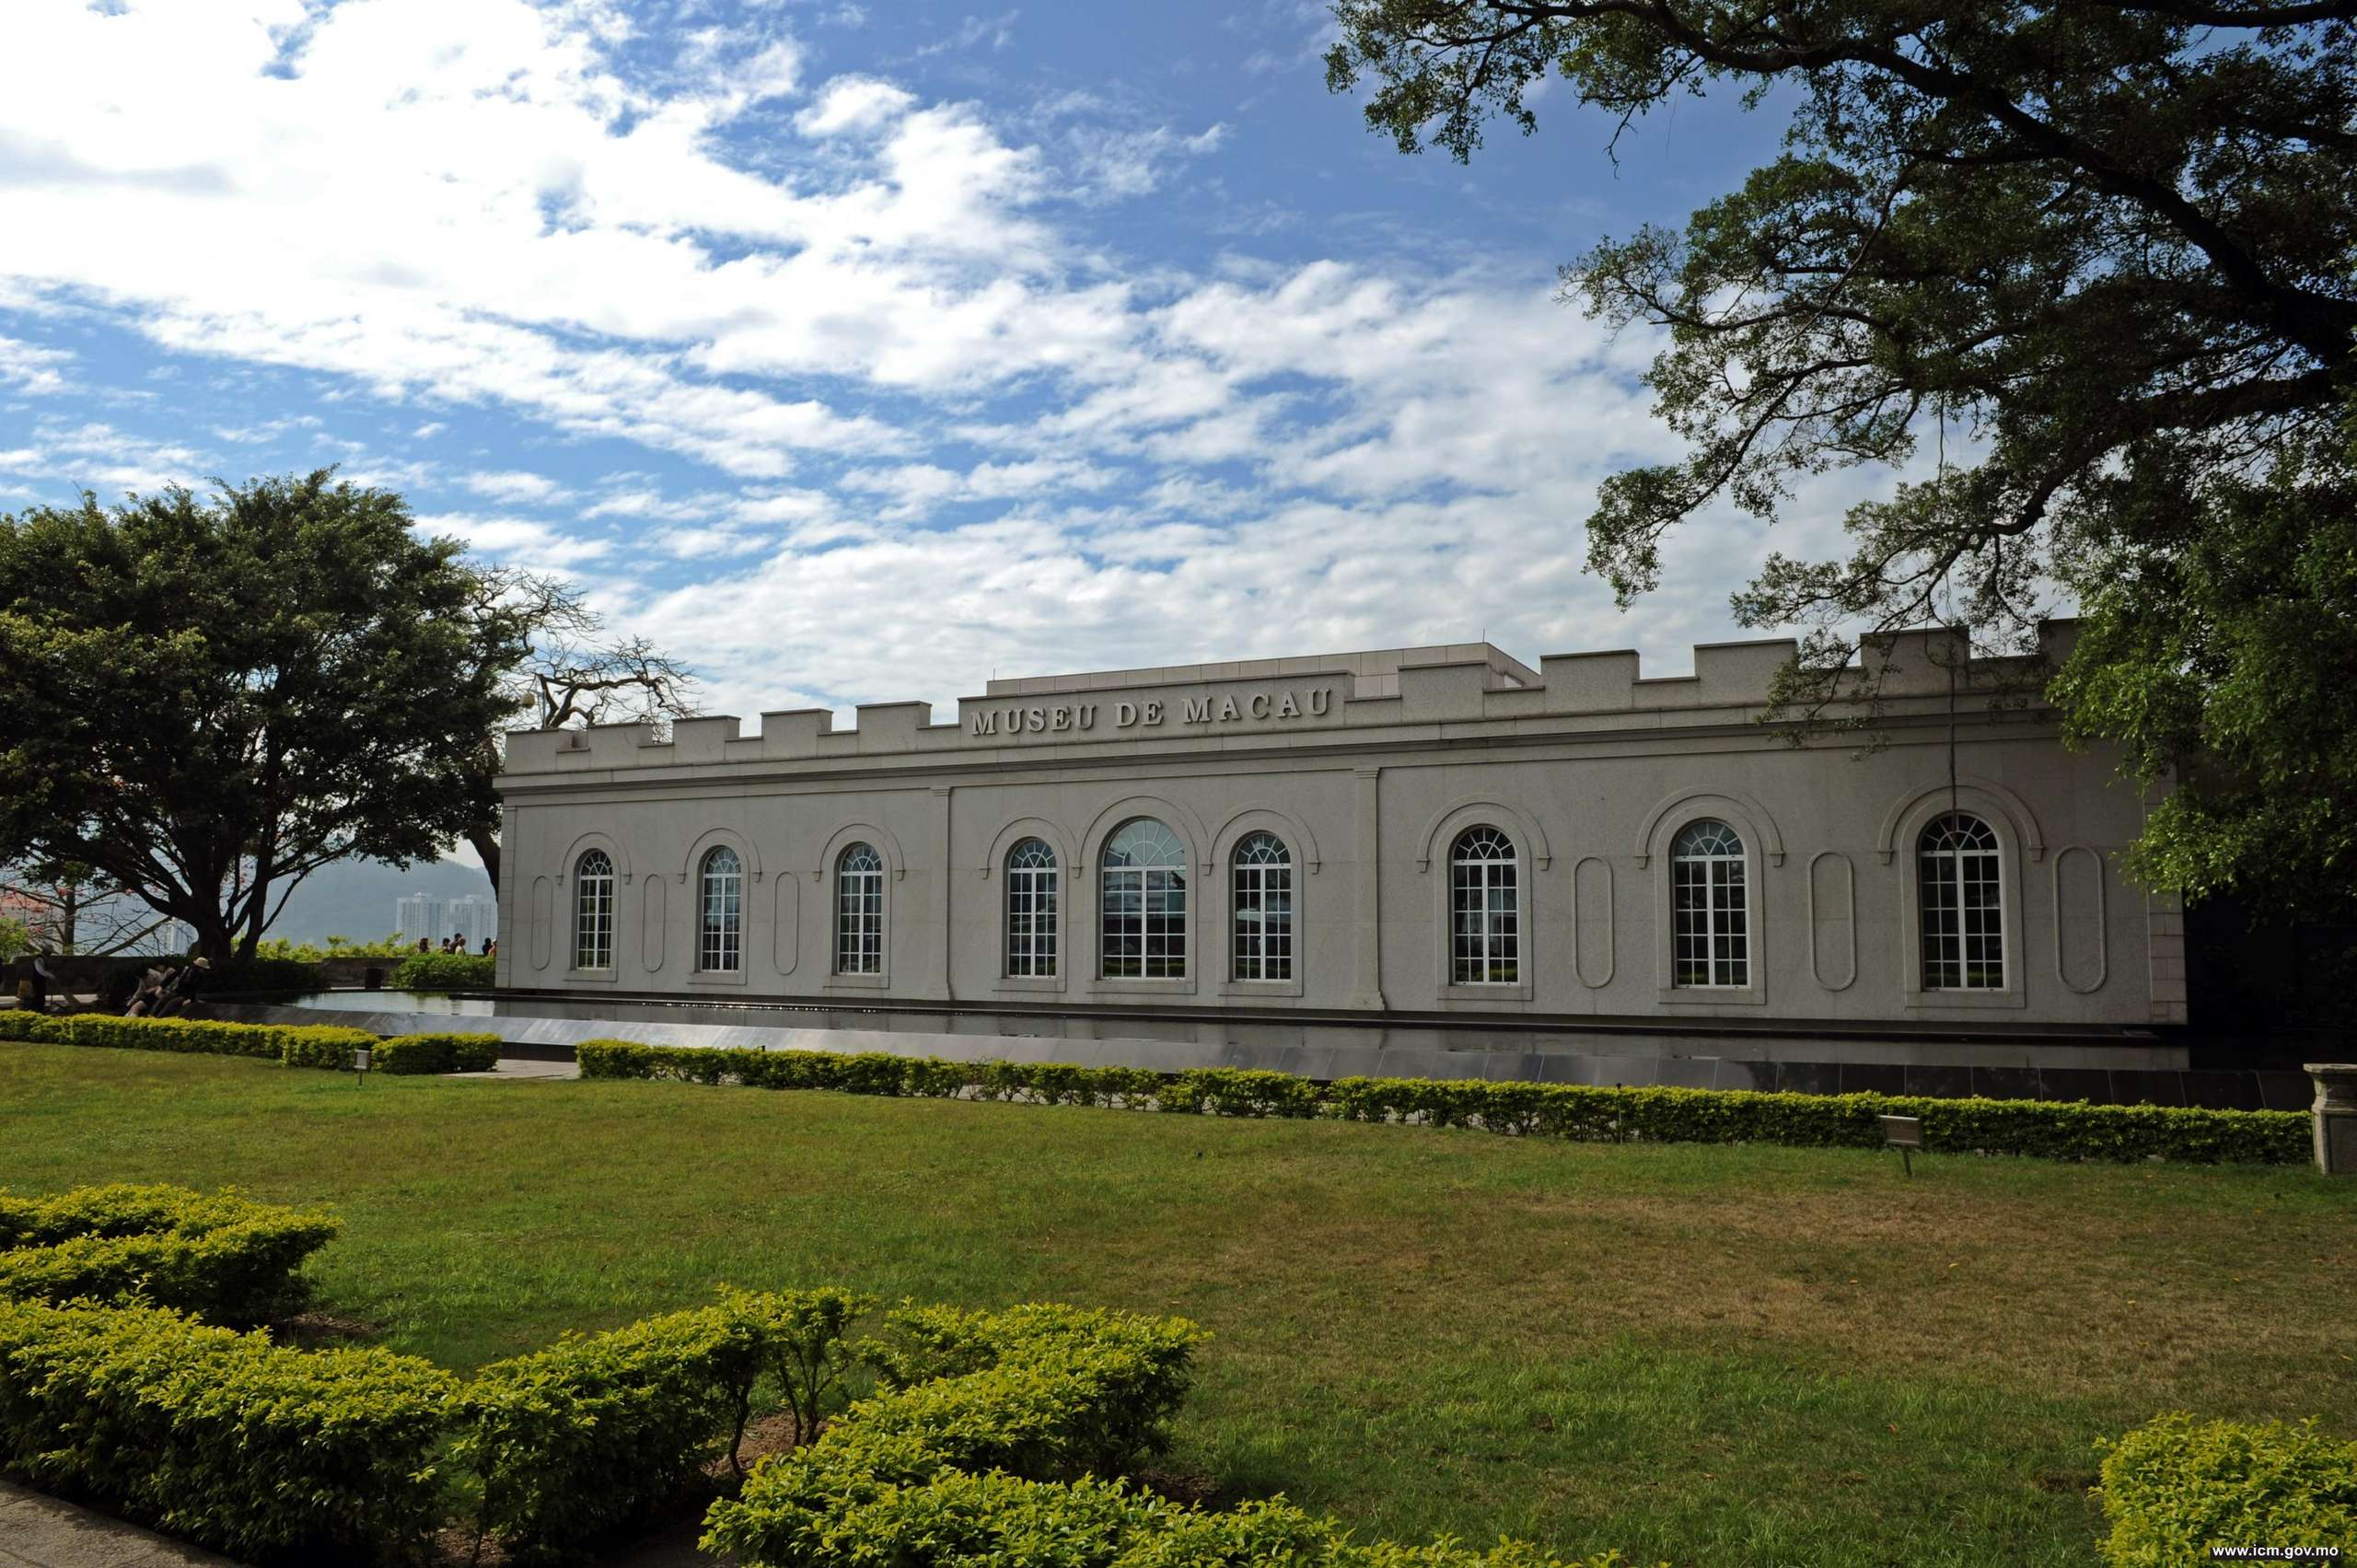 Macau Museum building outside